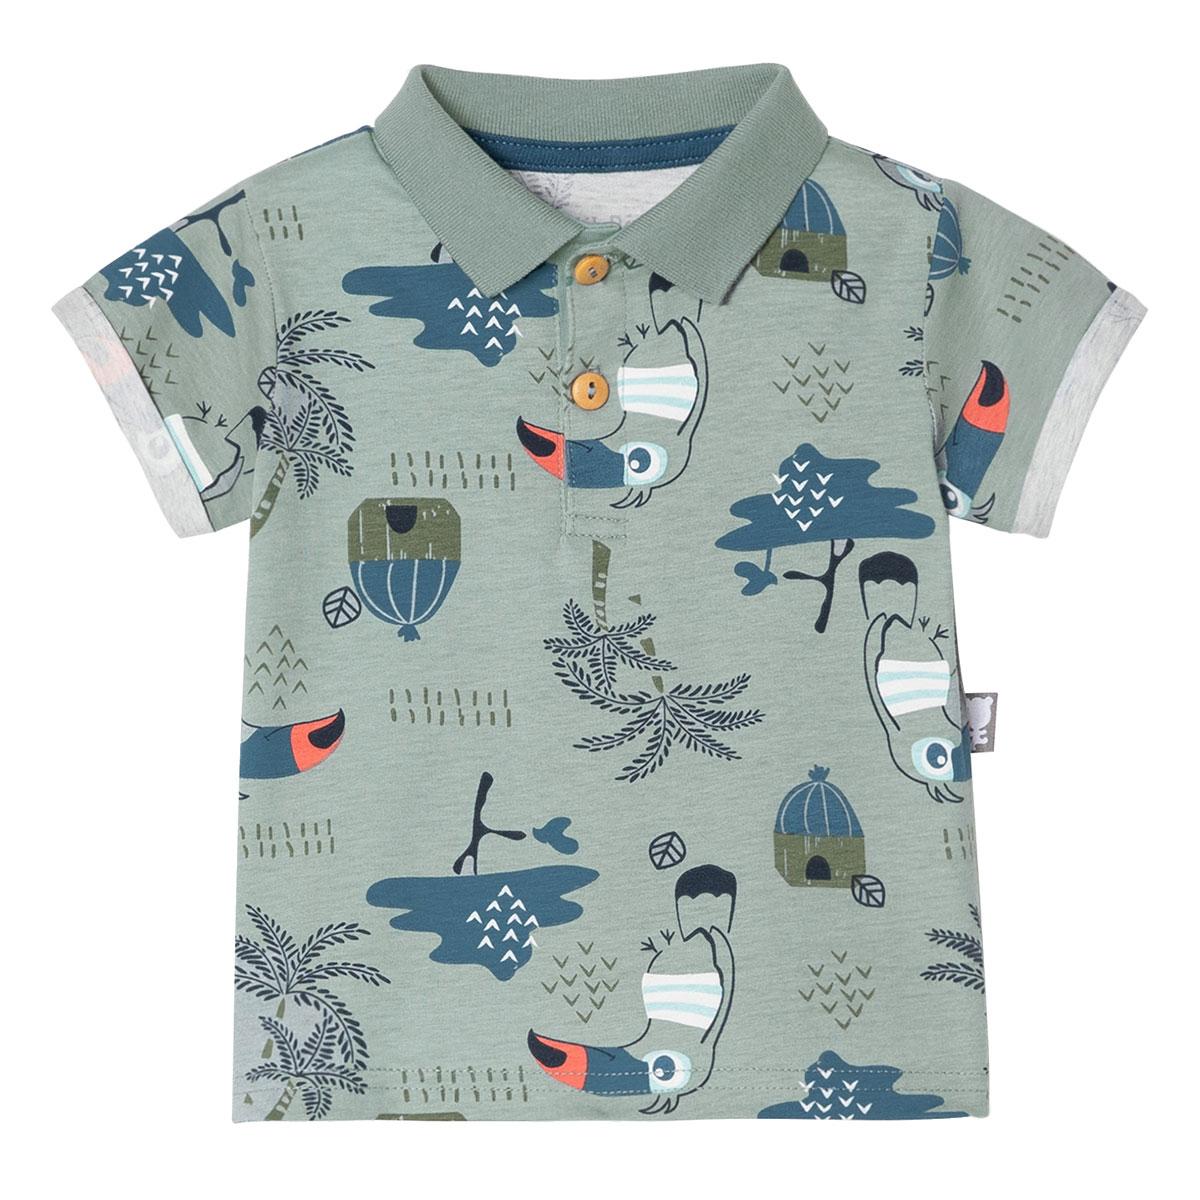 Ensemble bébé garçon chemise + pantalon Bora Bora haut